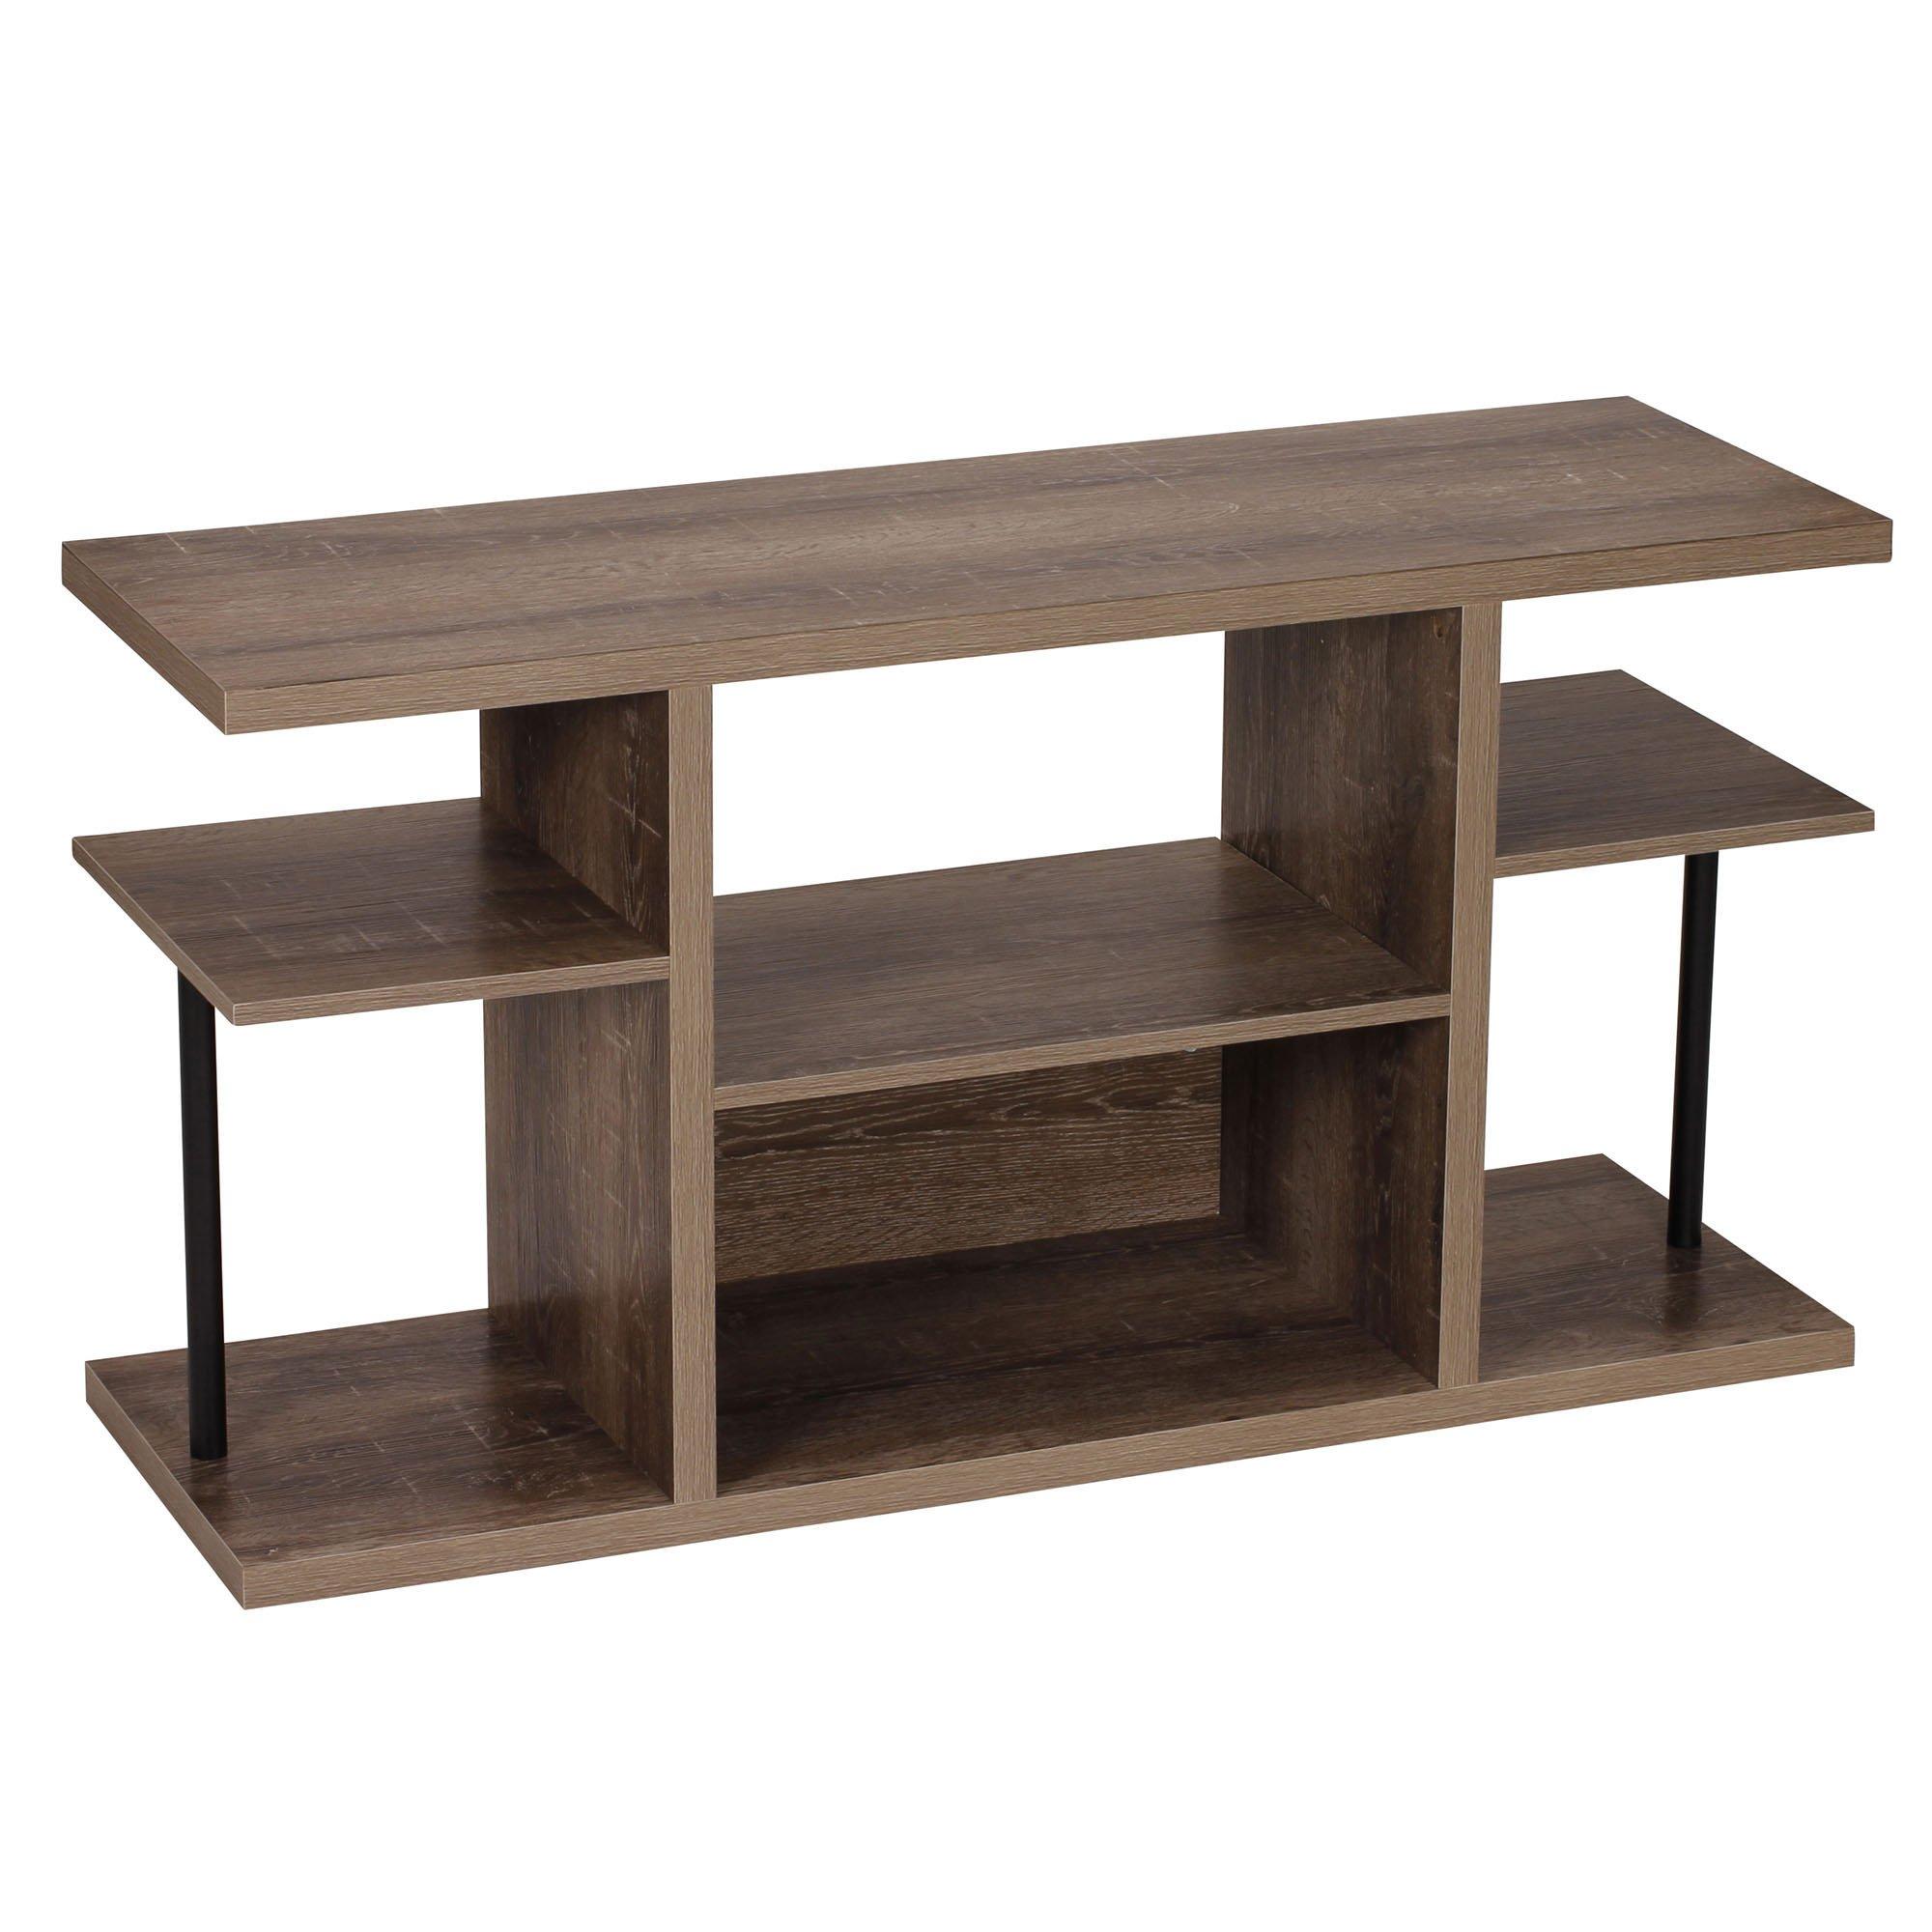 Household Essentials 8072-1 Ashwood Media Center | Entertainment TV Stand |6 Shelves for Storage